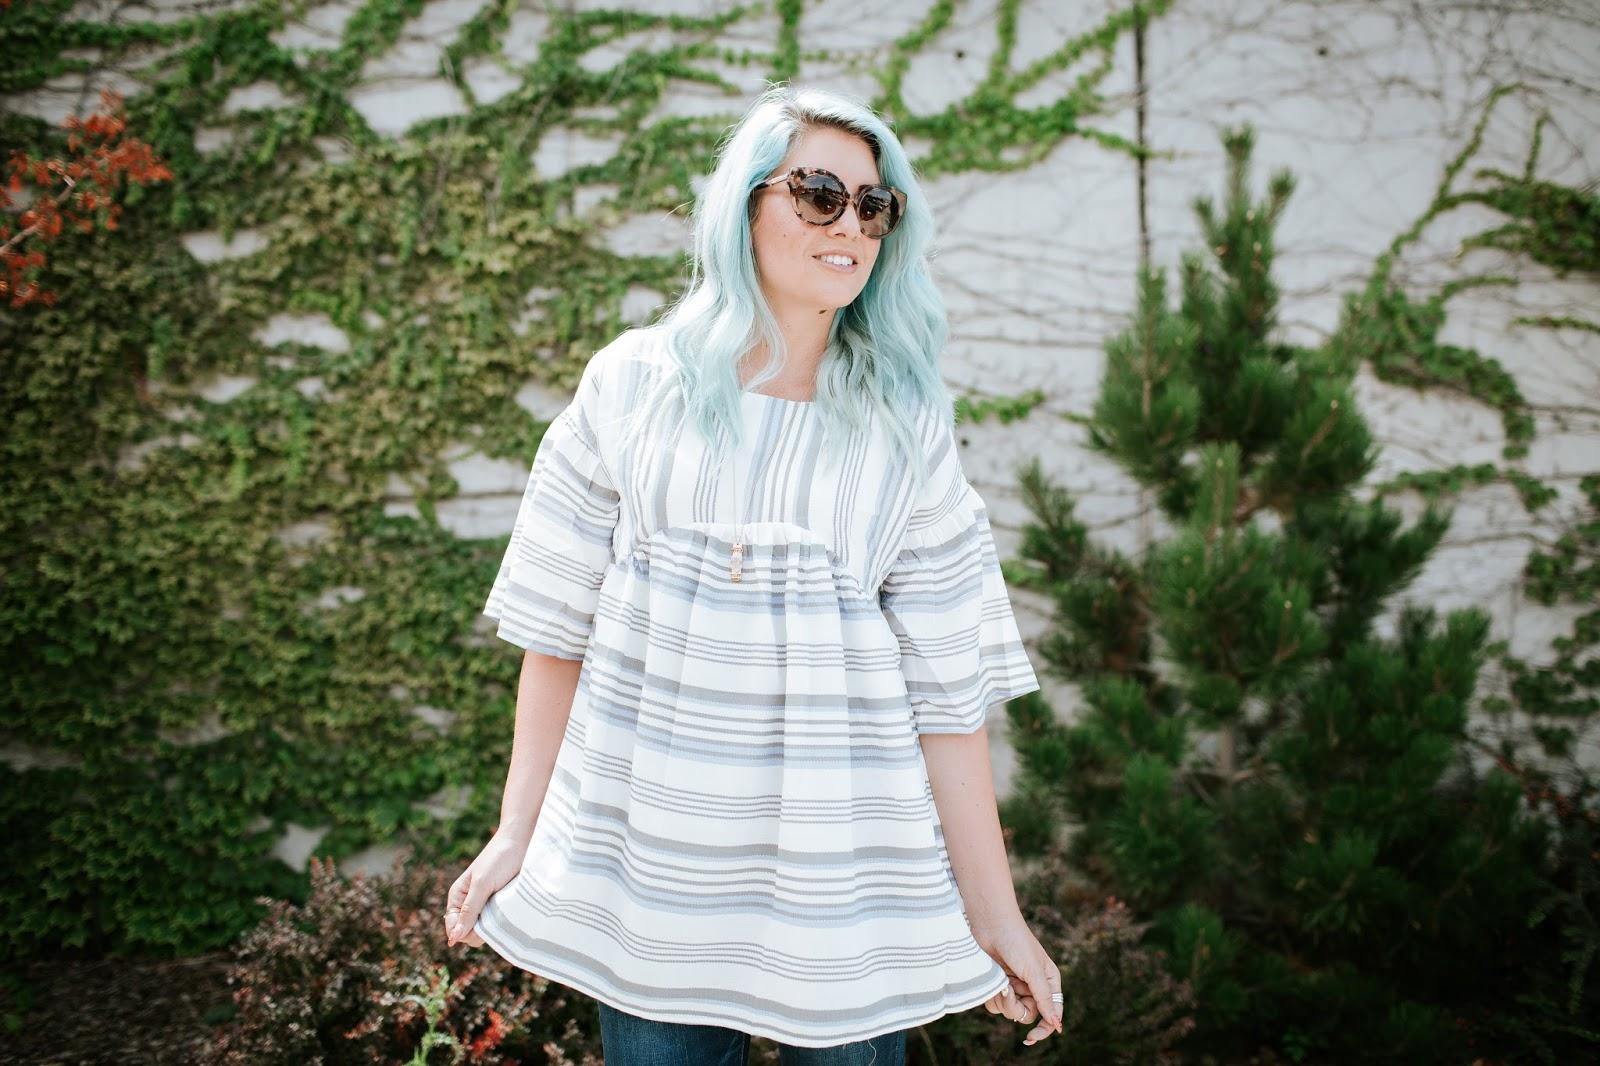 Tunic, Michael Kors, Blue Hair